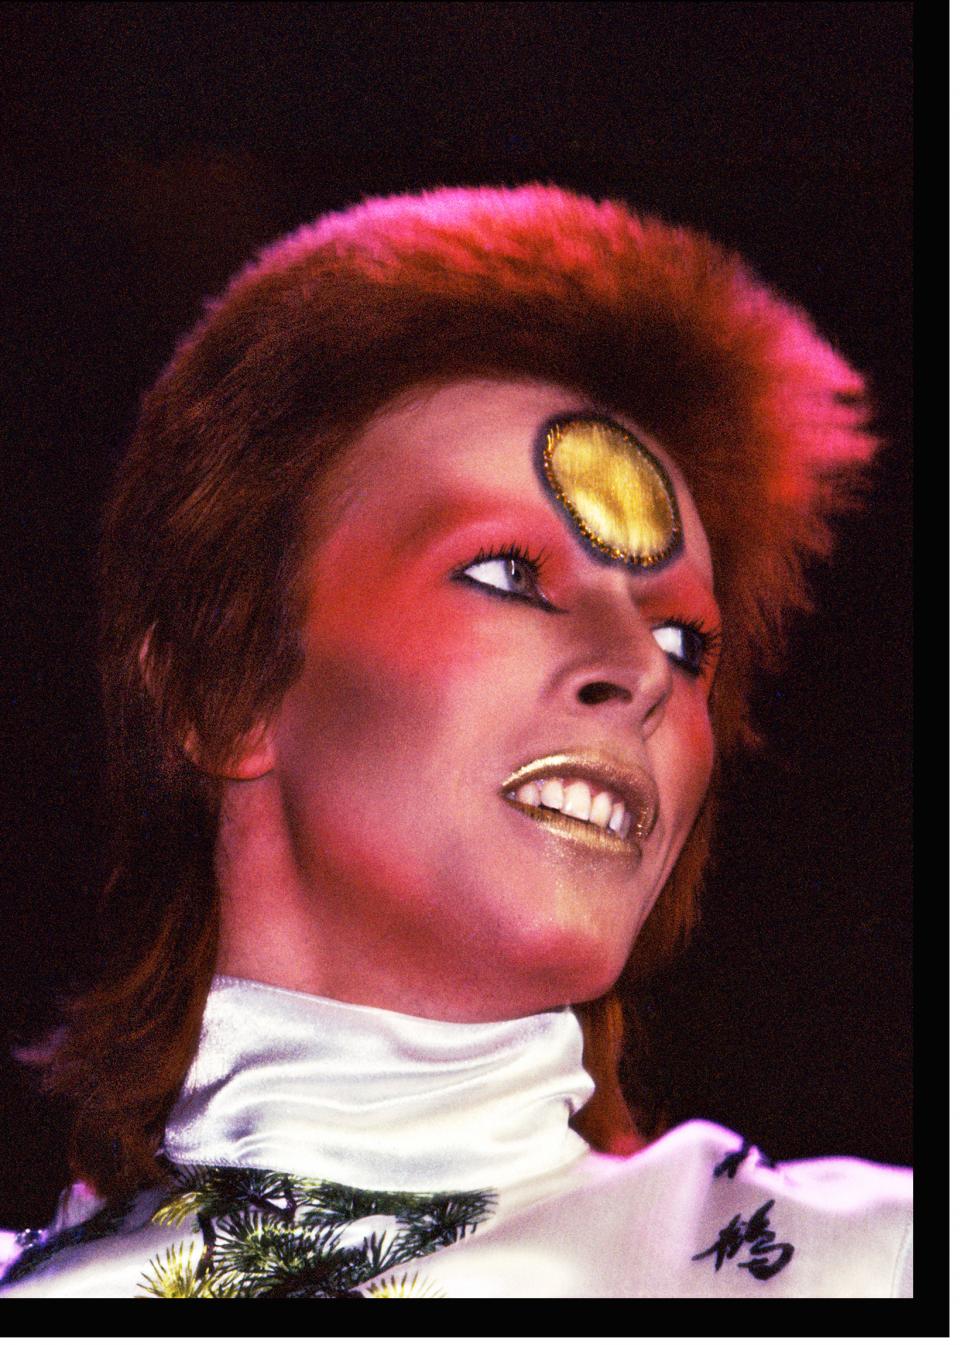 David Bowie Earl's Court 1973 by Mick Rock, $4000